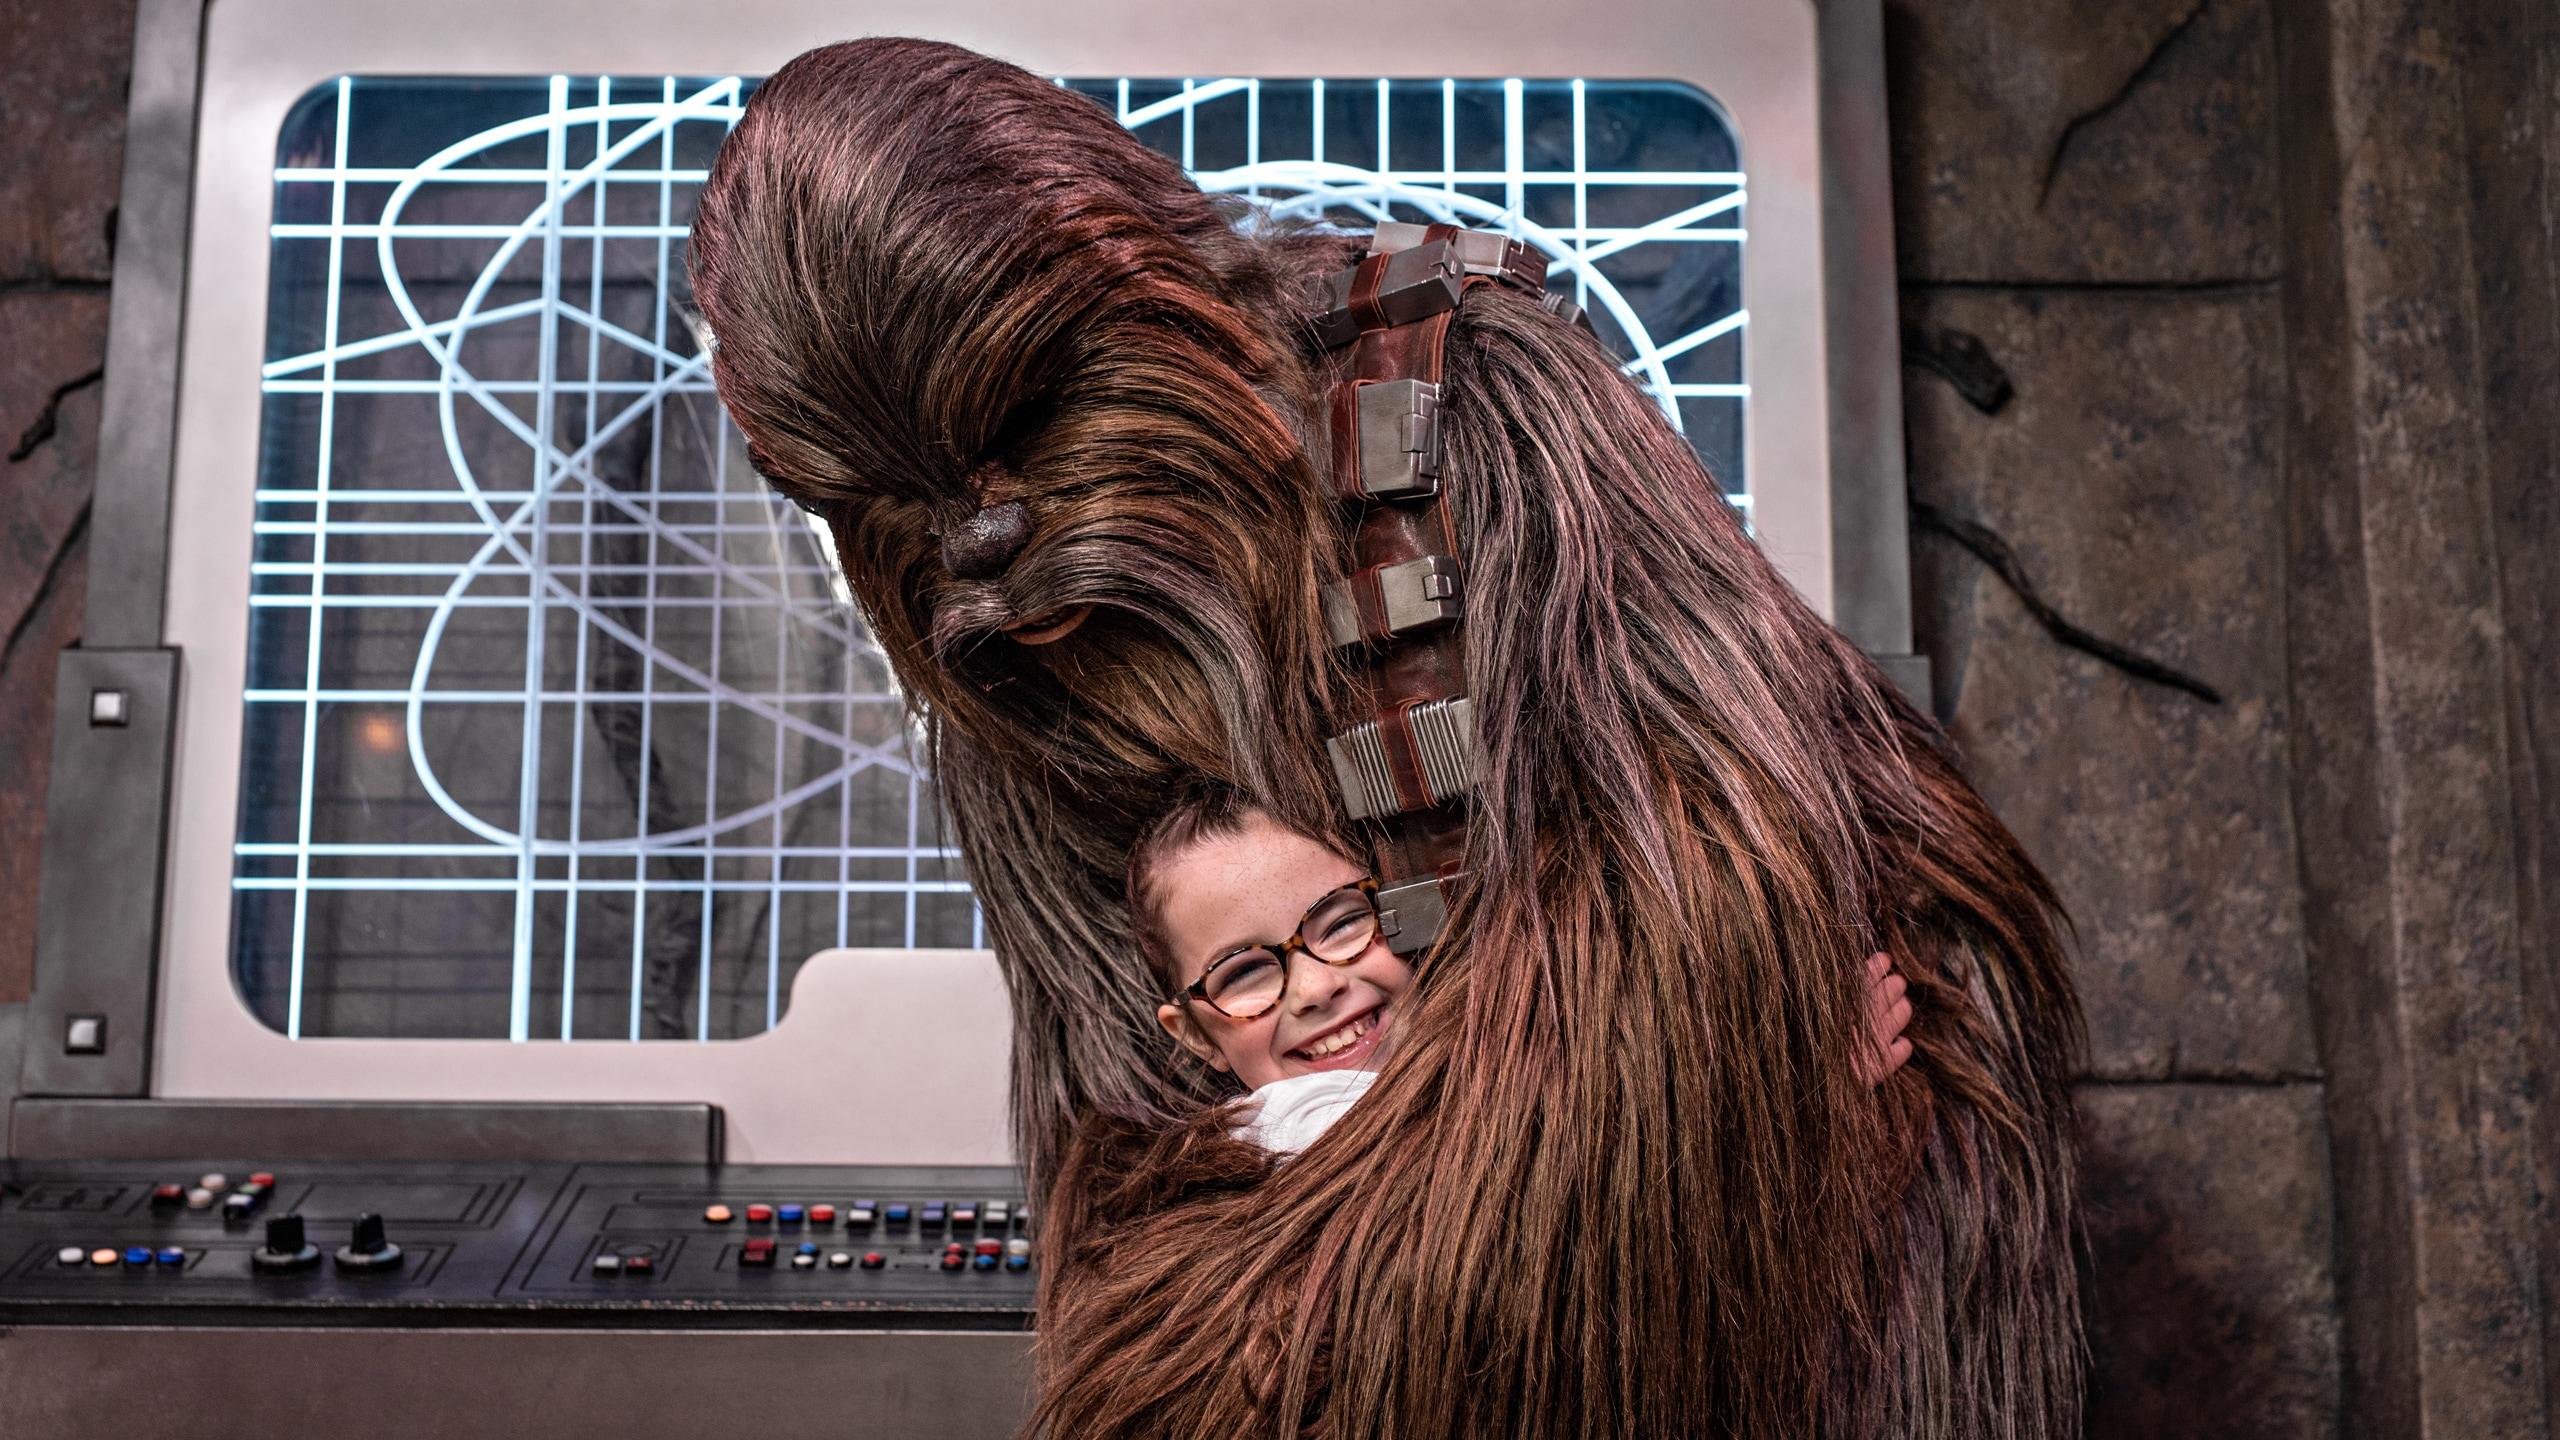 Chewbacca hugs a young girl in Star Wars Launch Bay